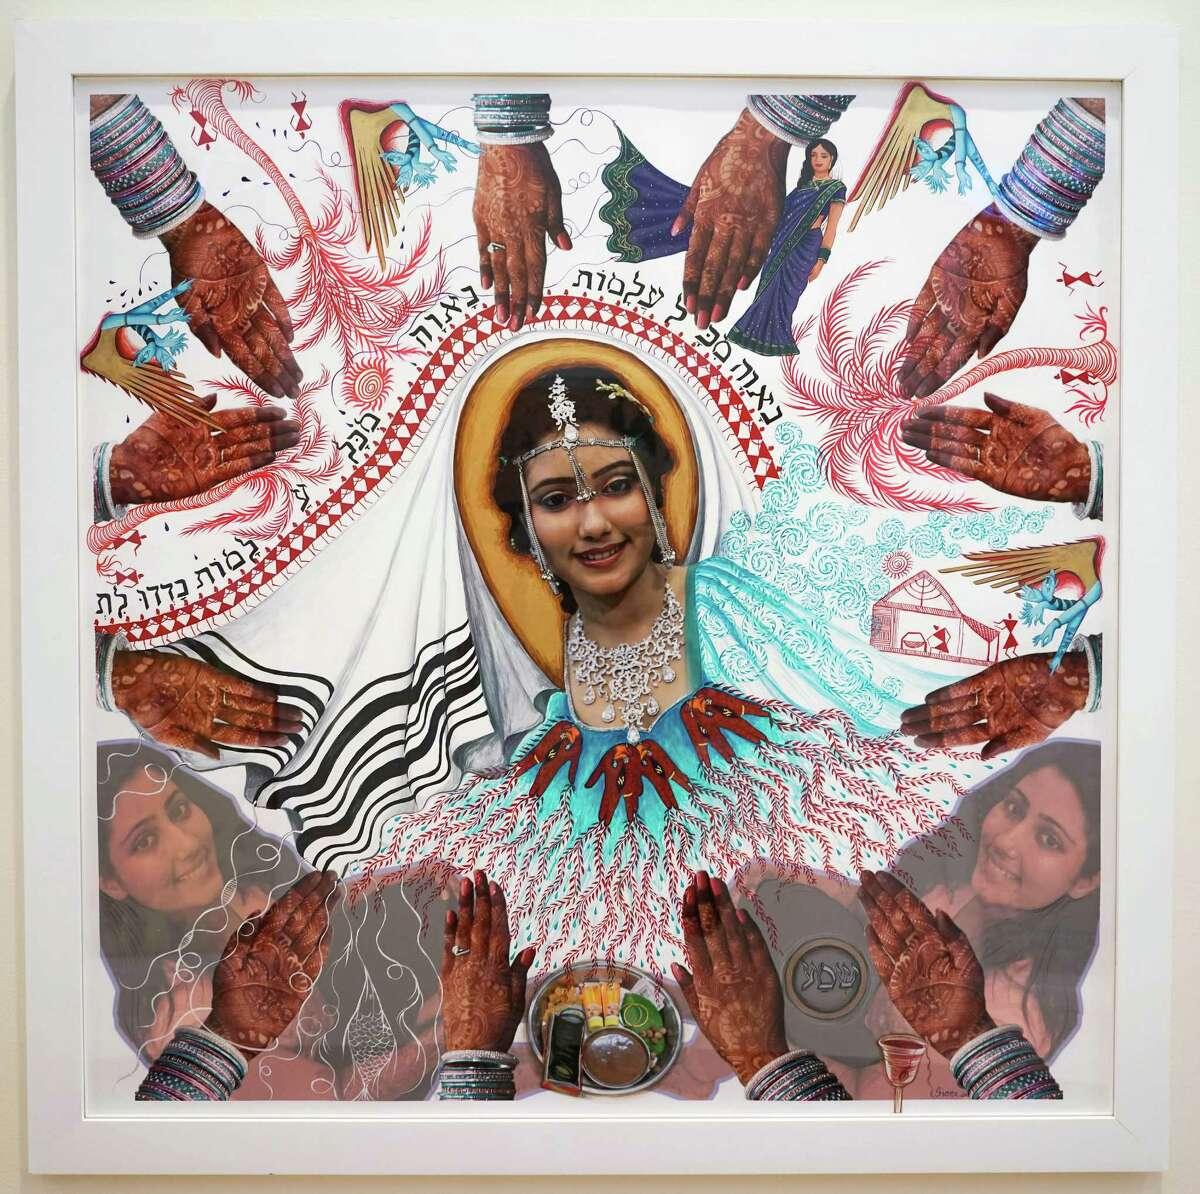 2011 photomontage-based Karen Simon (Borgawkar), Indian Jewish Bride by Siona Benjamin (Courtesy Opalka Gallery)